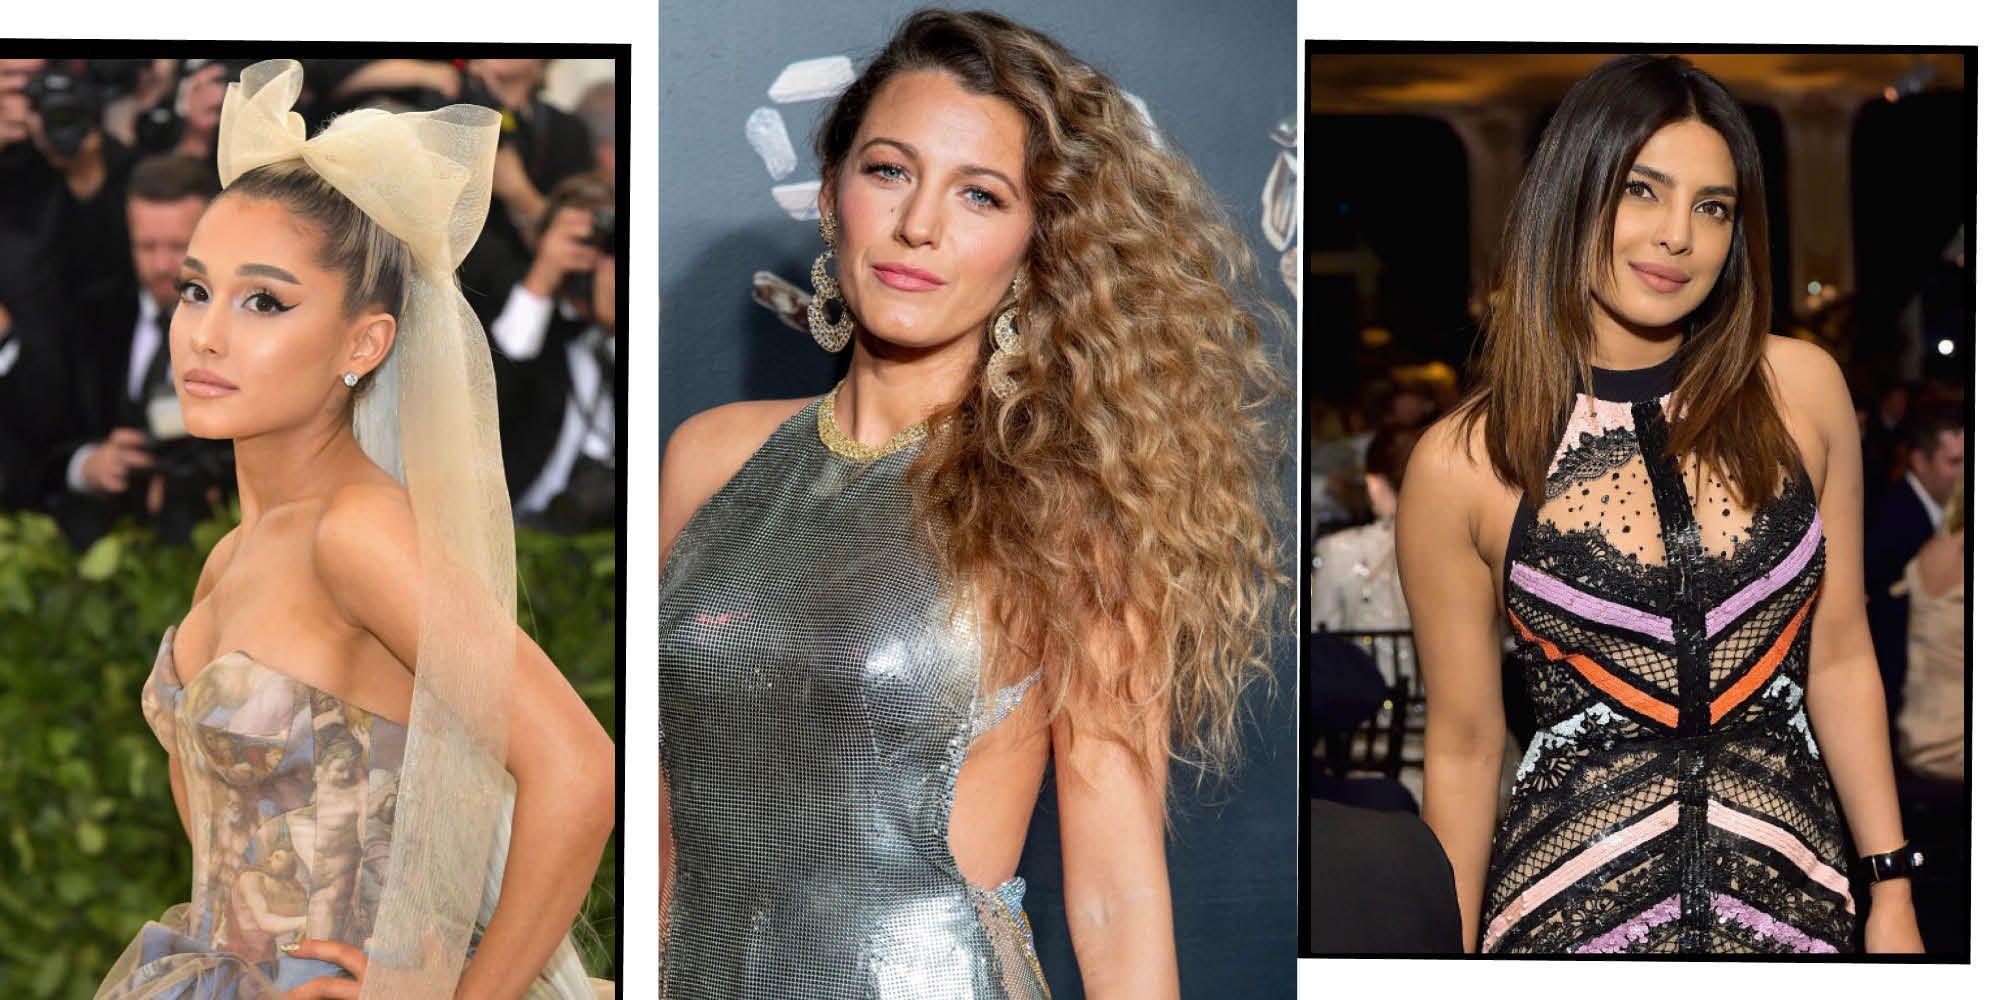 48 Celebrities Cheering Us Up During Coronavirus Social Distancing